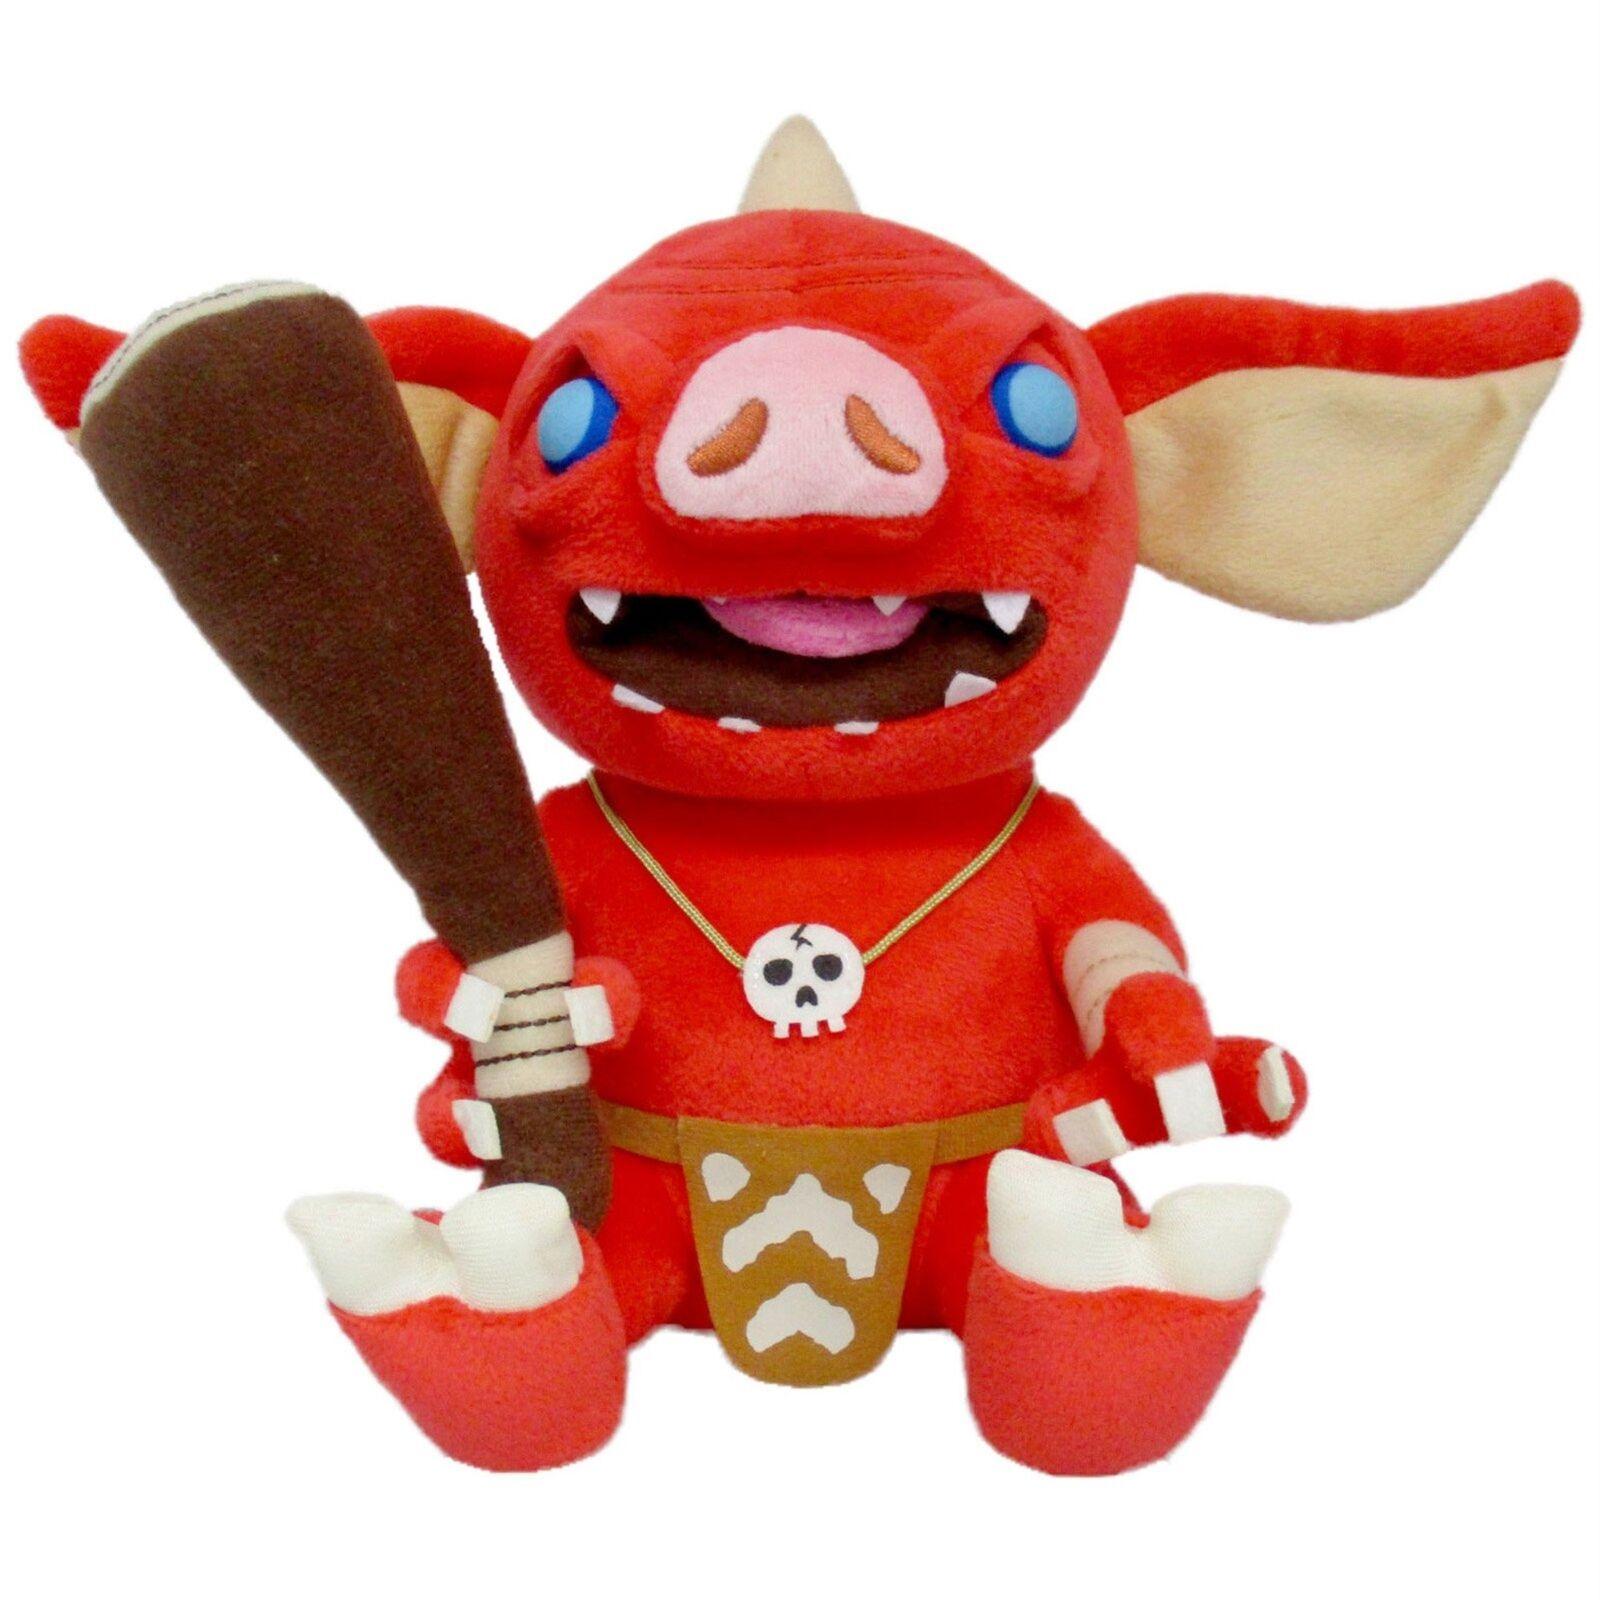 The Legend Of Zelda Breath Of The Wild Bokoblin Stuffed Plush Doll Toy